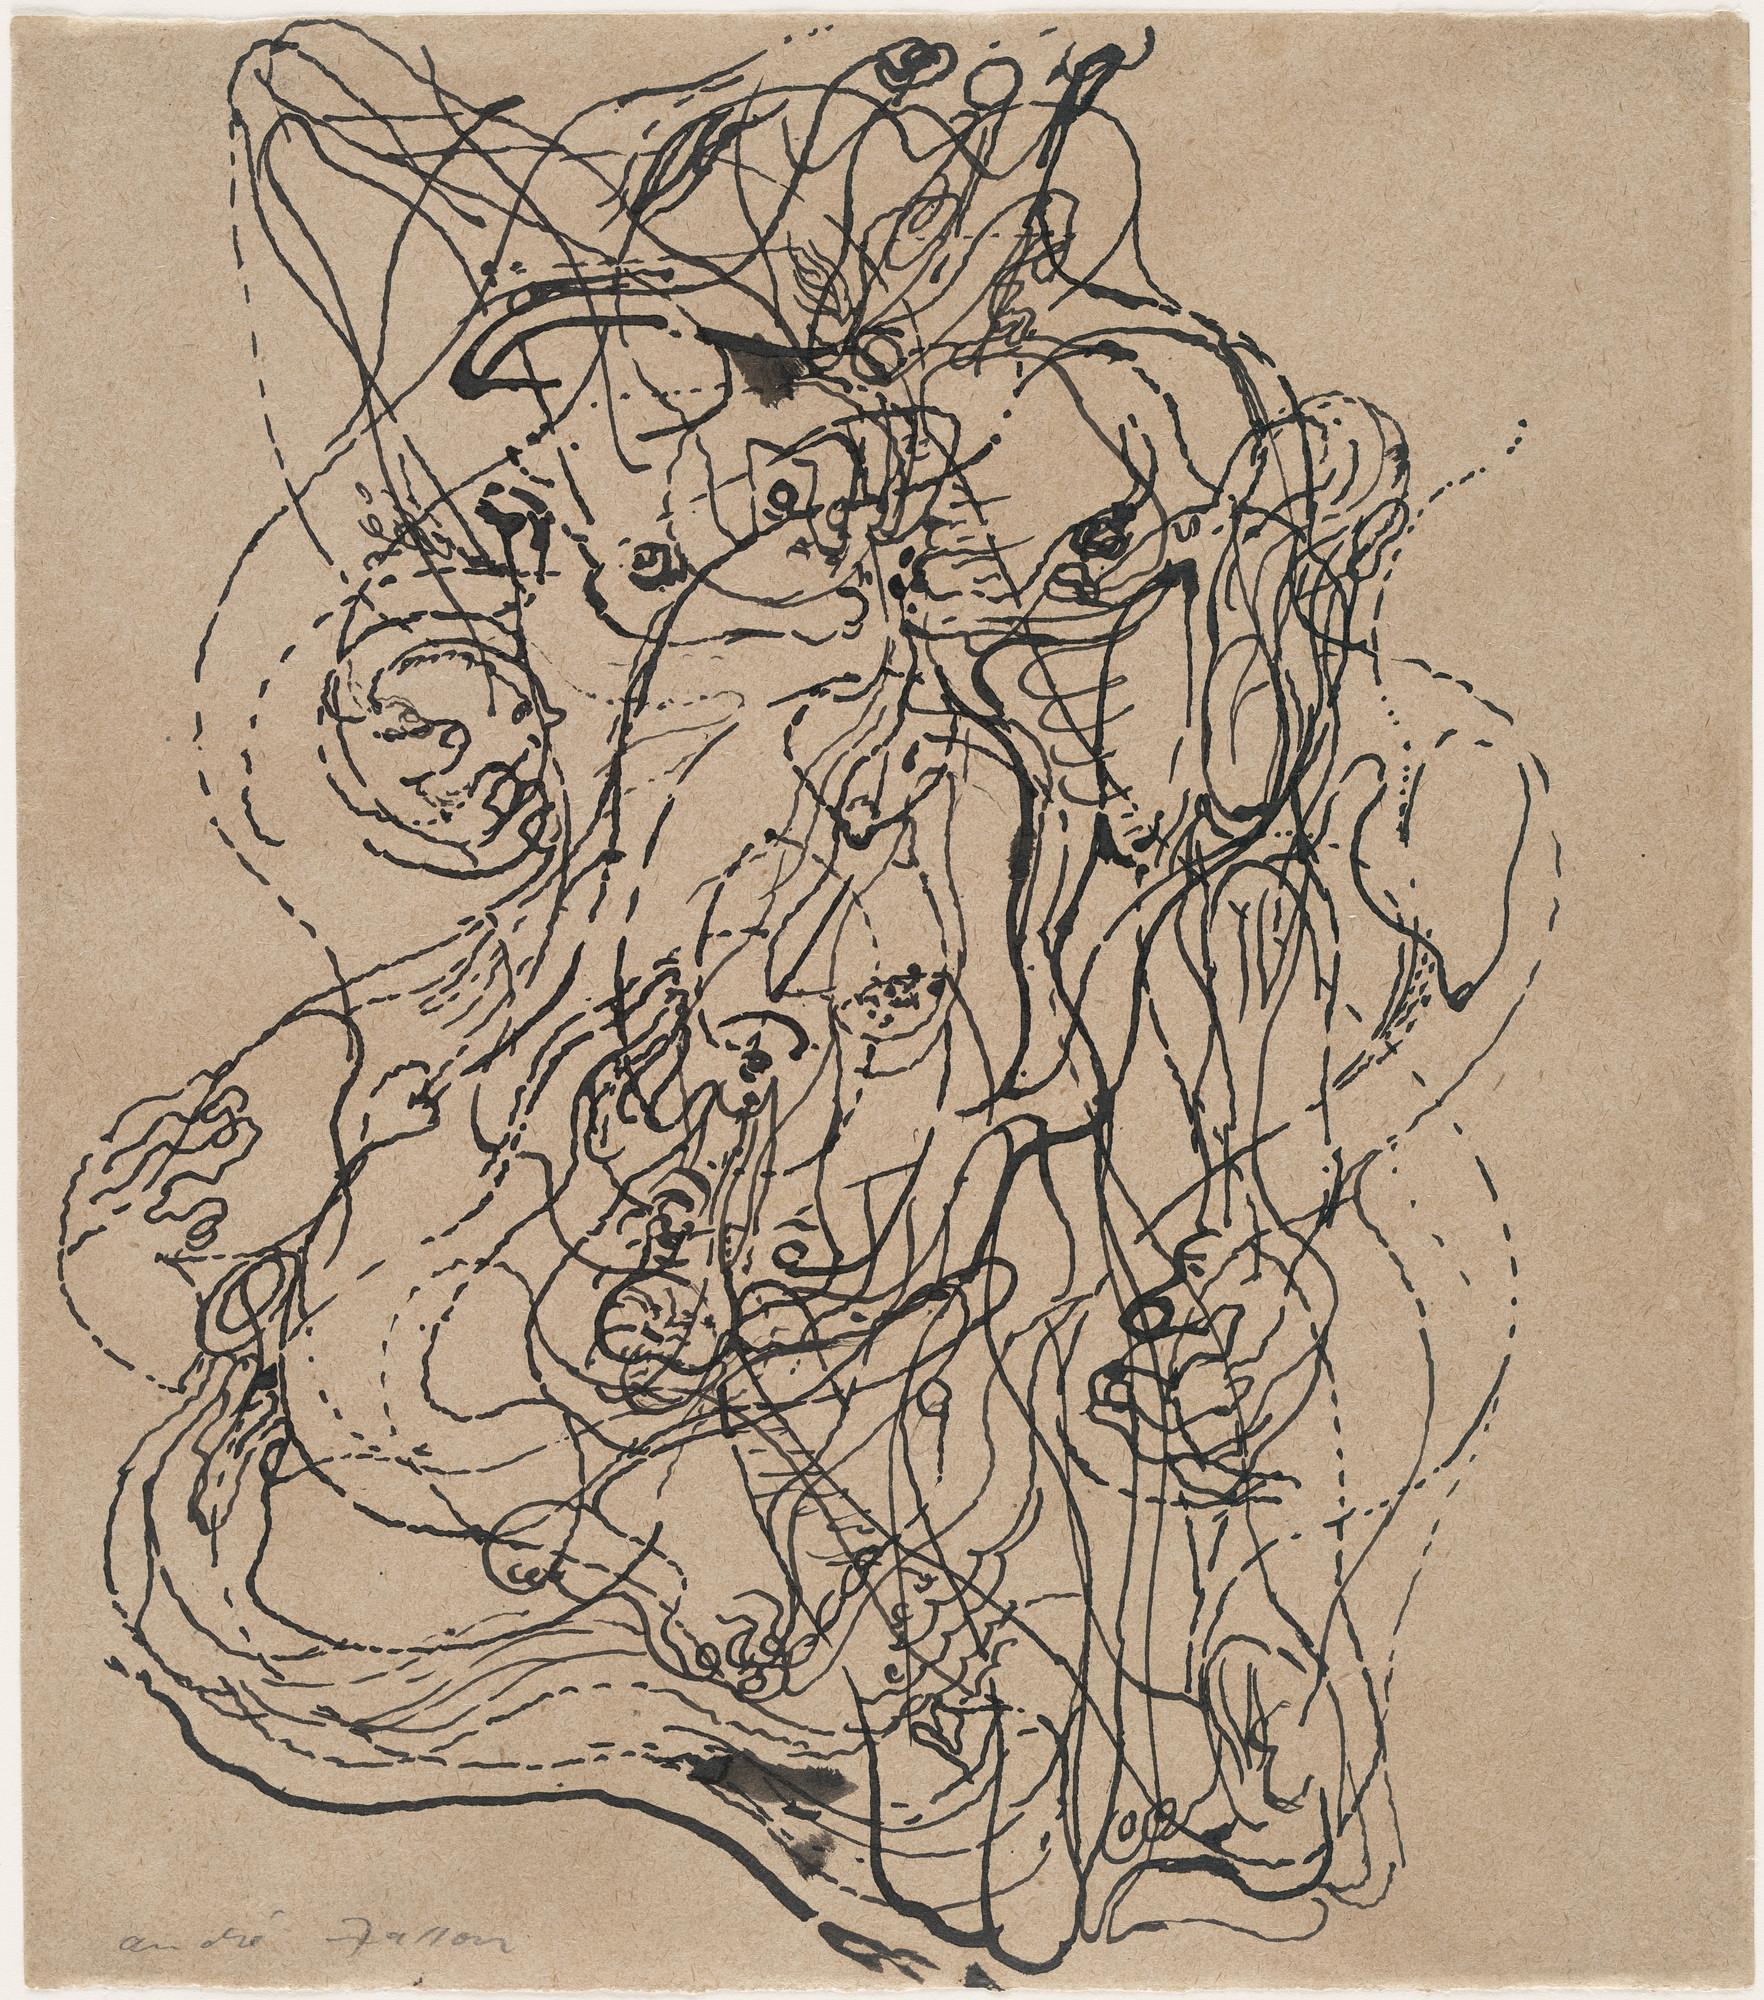 File:Masson automatic drawing.jpg